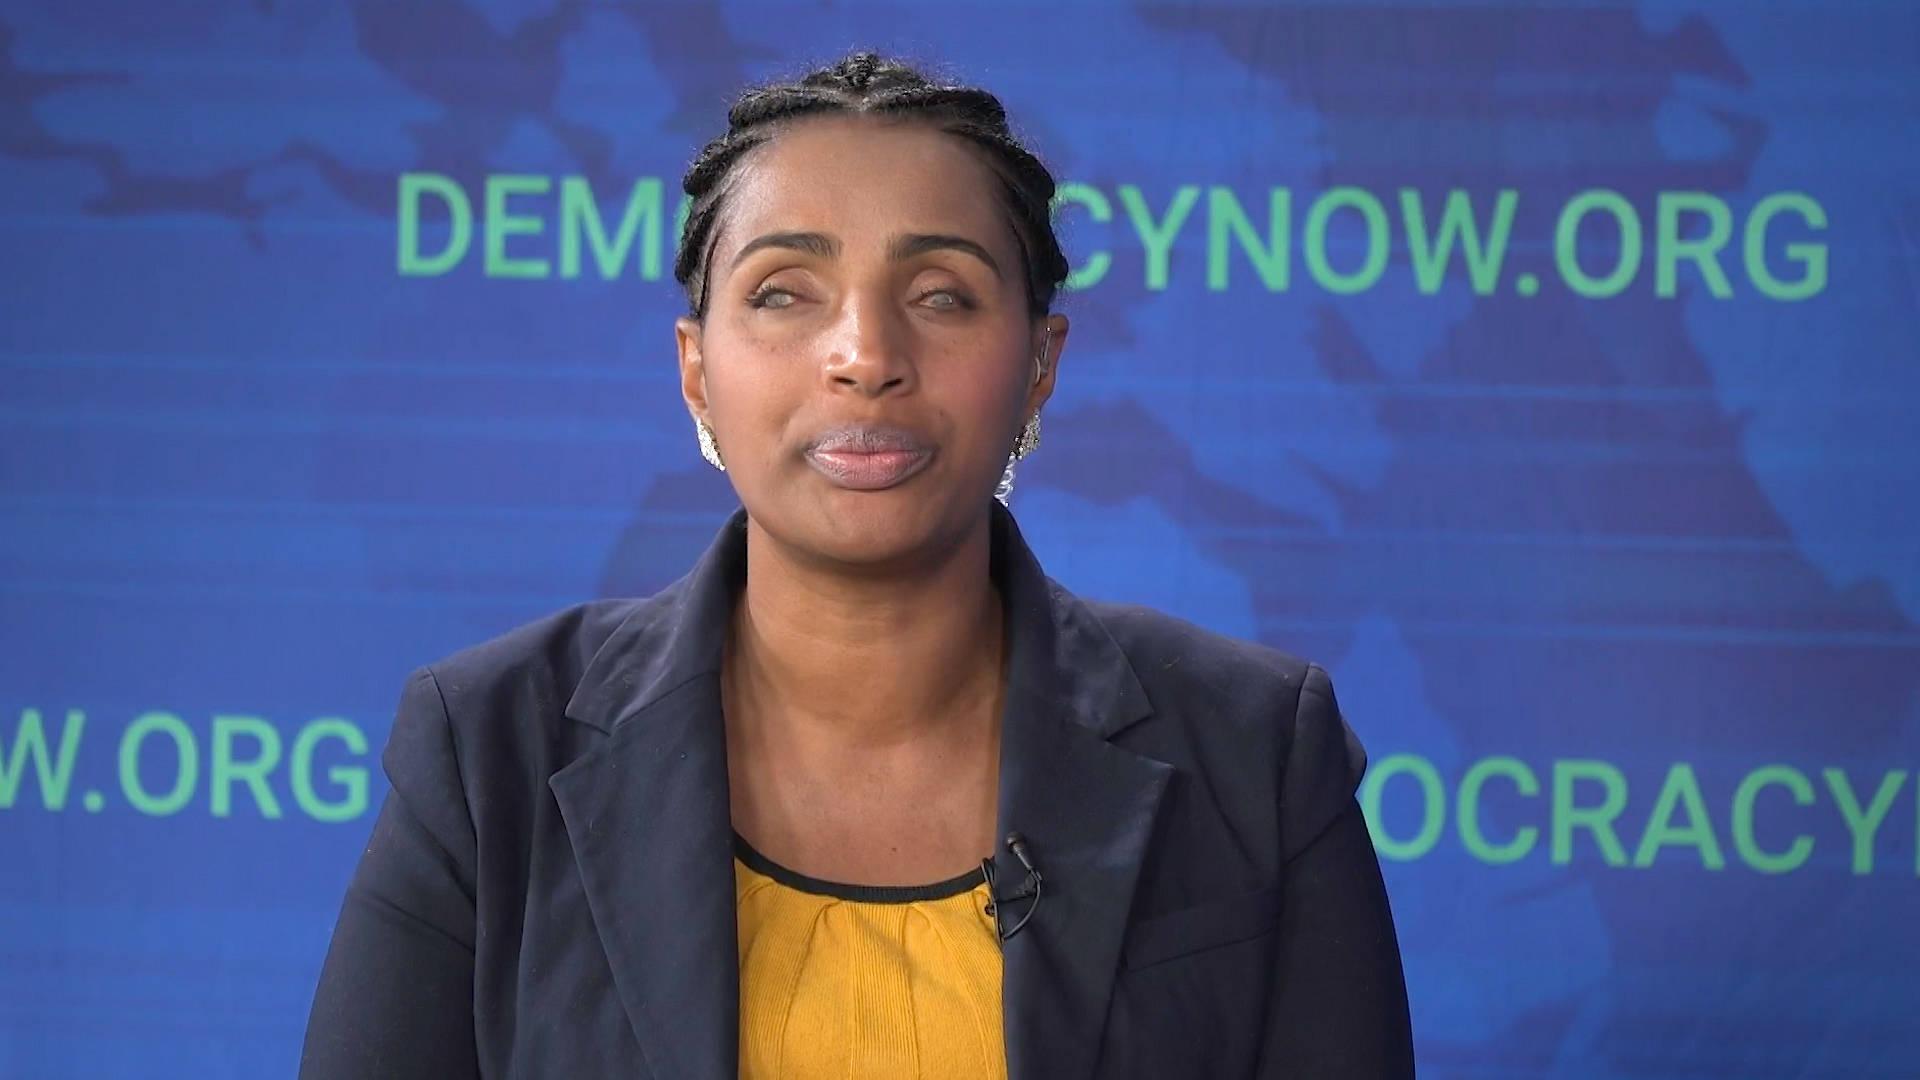 Meet Yetnebersh Nigussie: A Blind Ethiopian Lawyer Fighting for Global Disability Rights